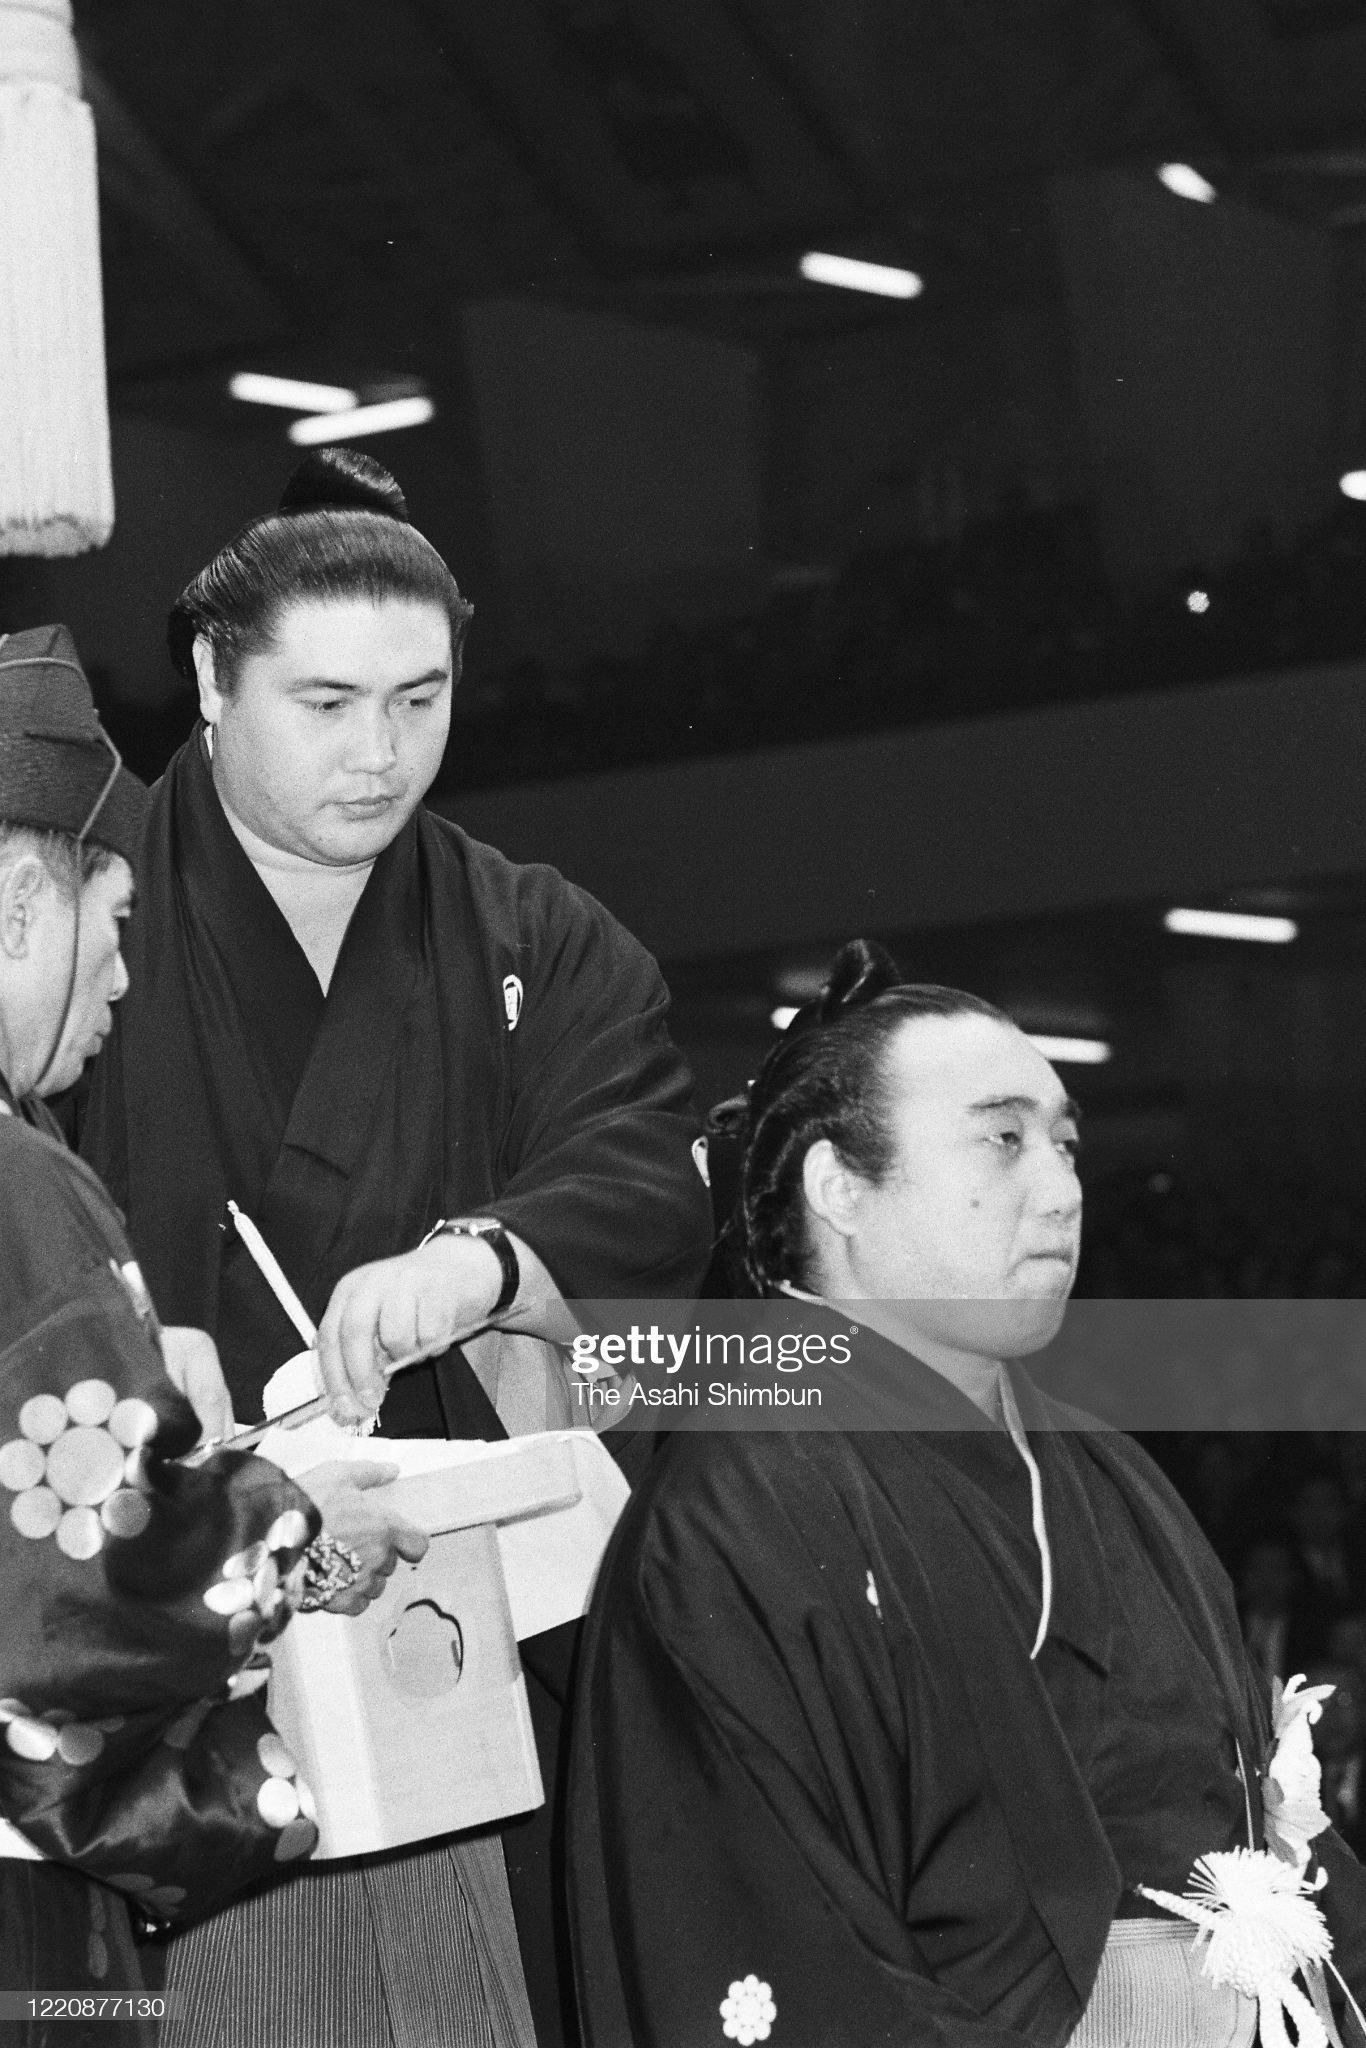 yokozuna-kashiwado-lets-his-topknot-cut-